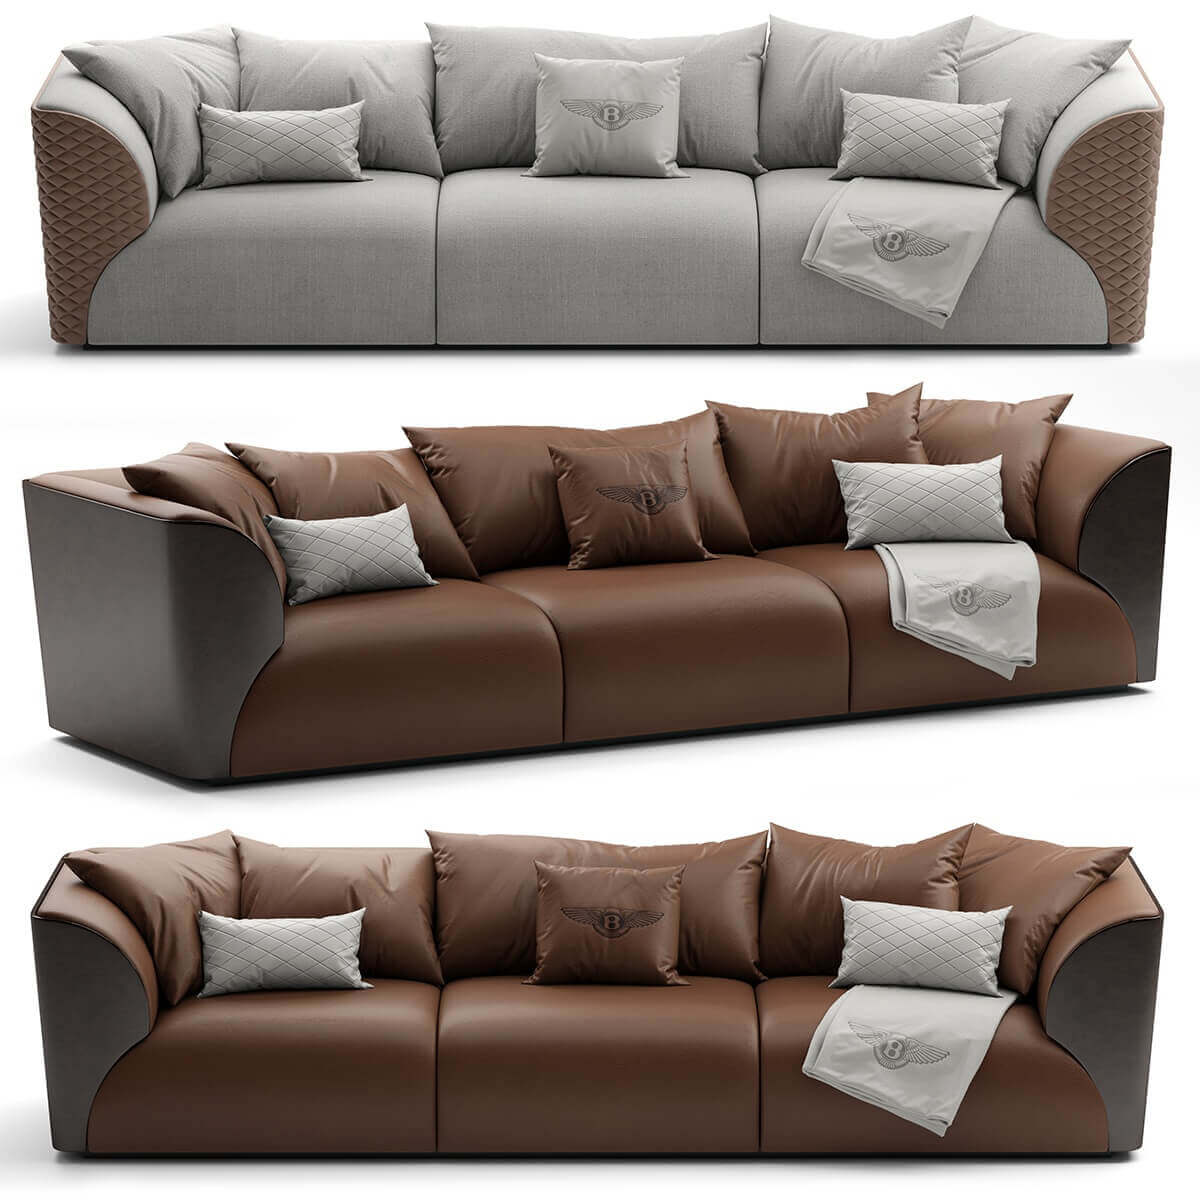 Sofa Bentley Home Winston Model 2